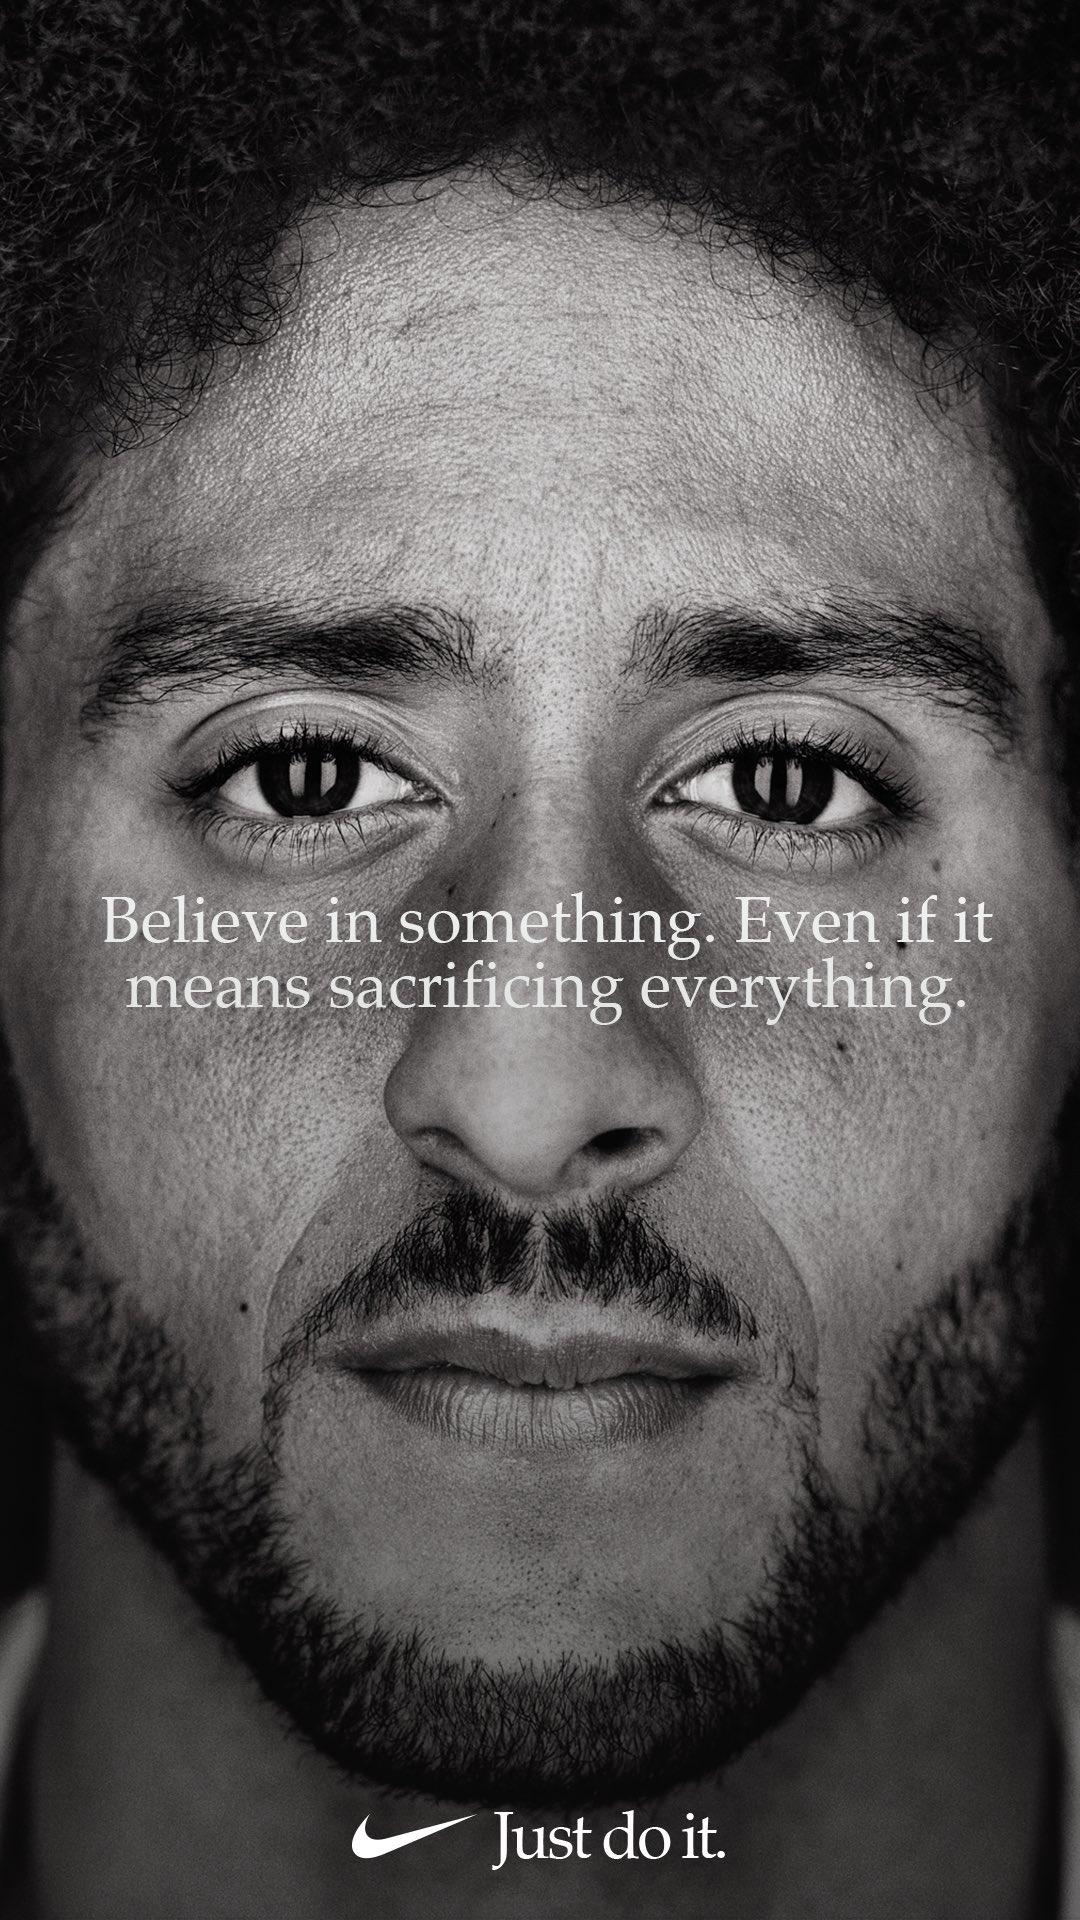 30th Anniversary Nike ad featuring Colin Kaepernick